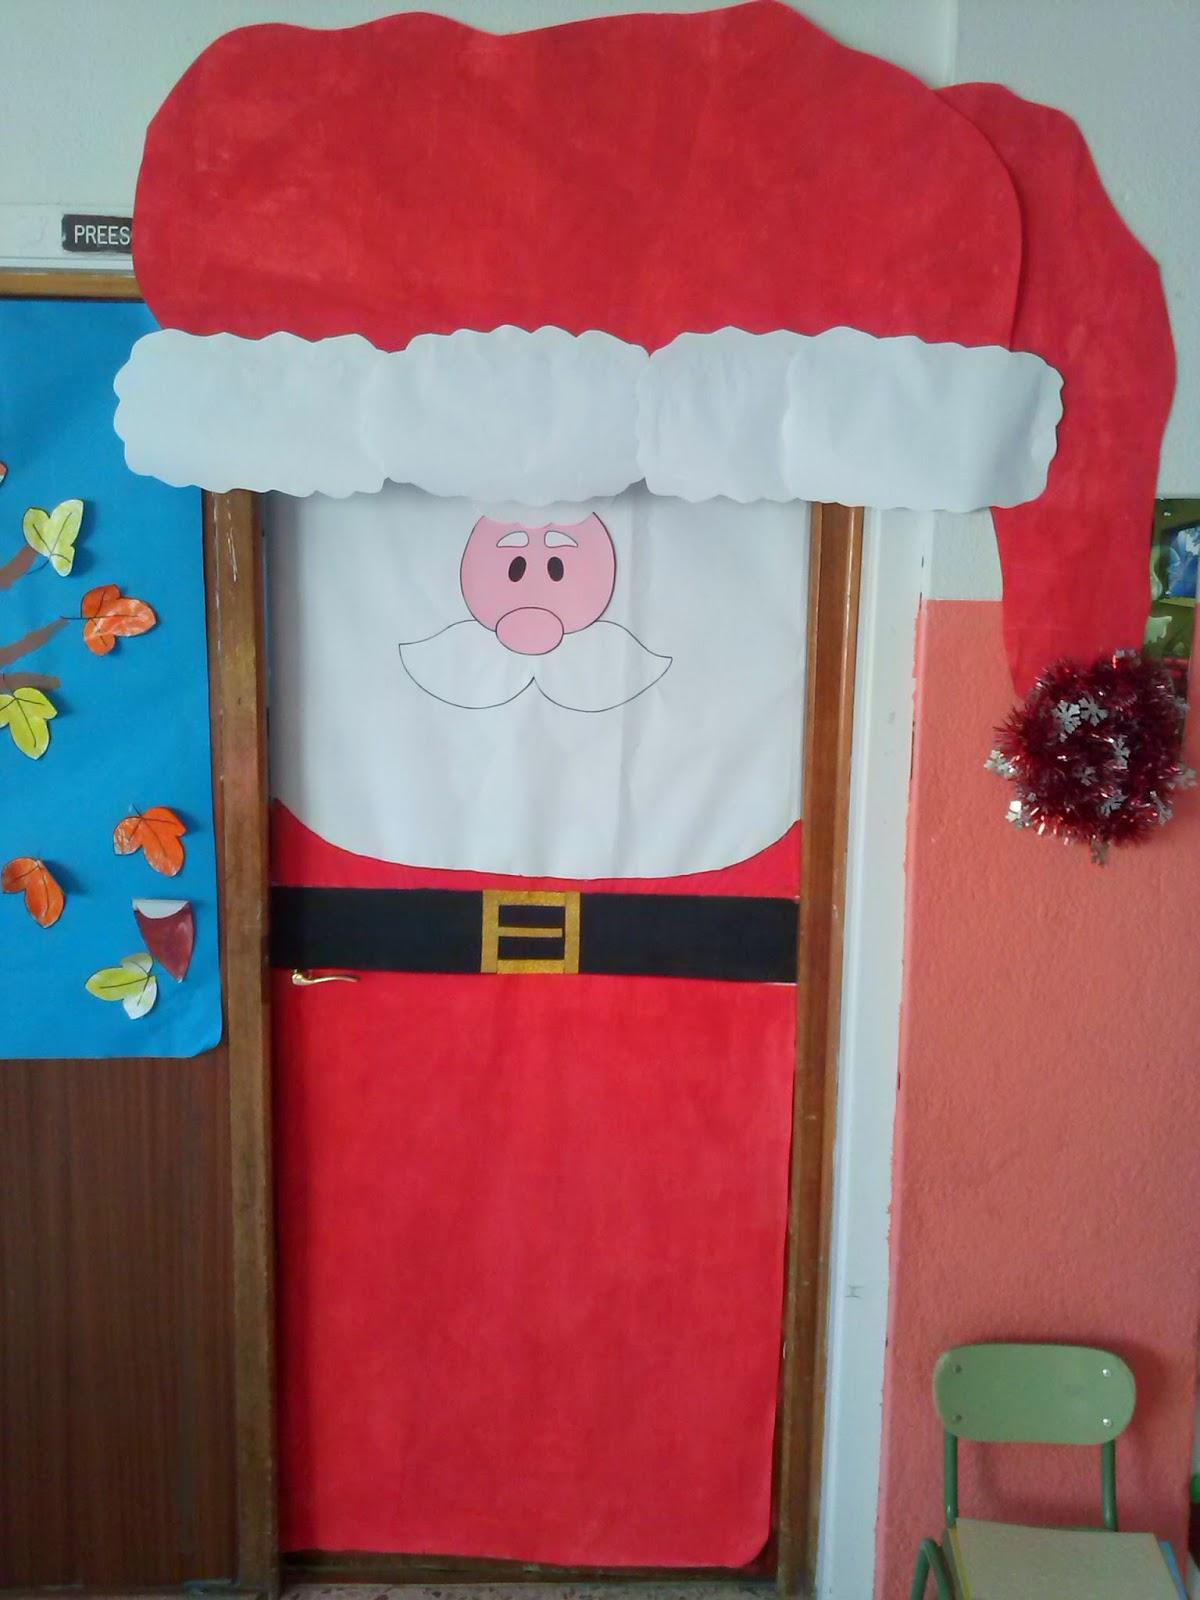 Infantil aula 3 a os decoraci n navide a colegio for Decoracion navidena infantil